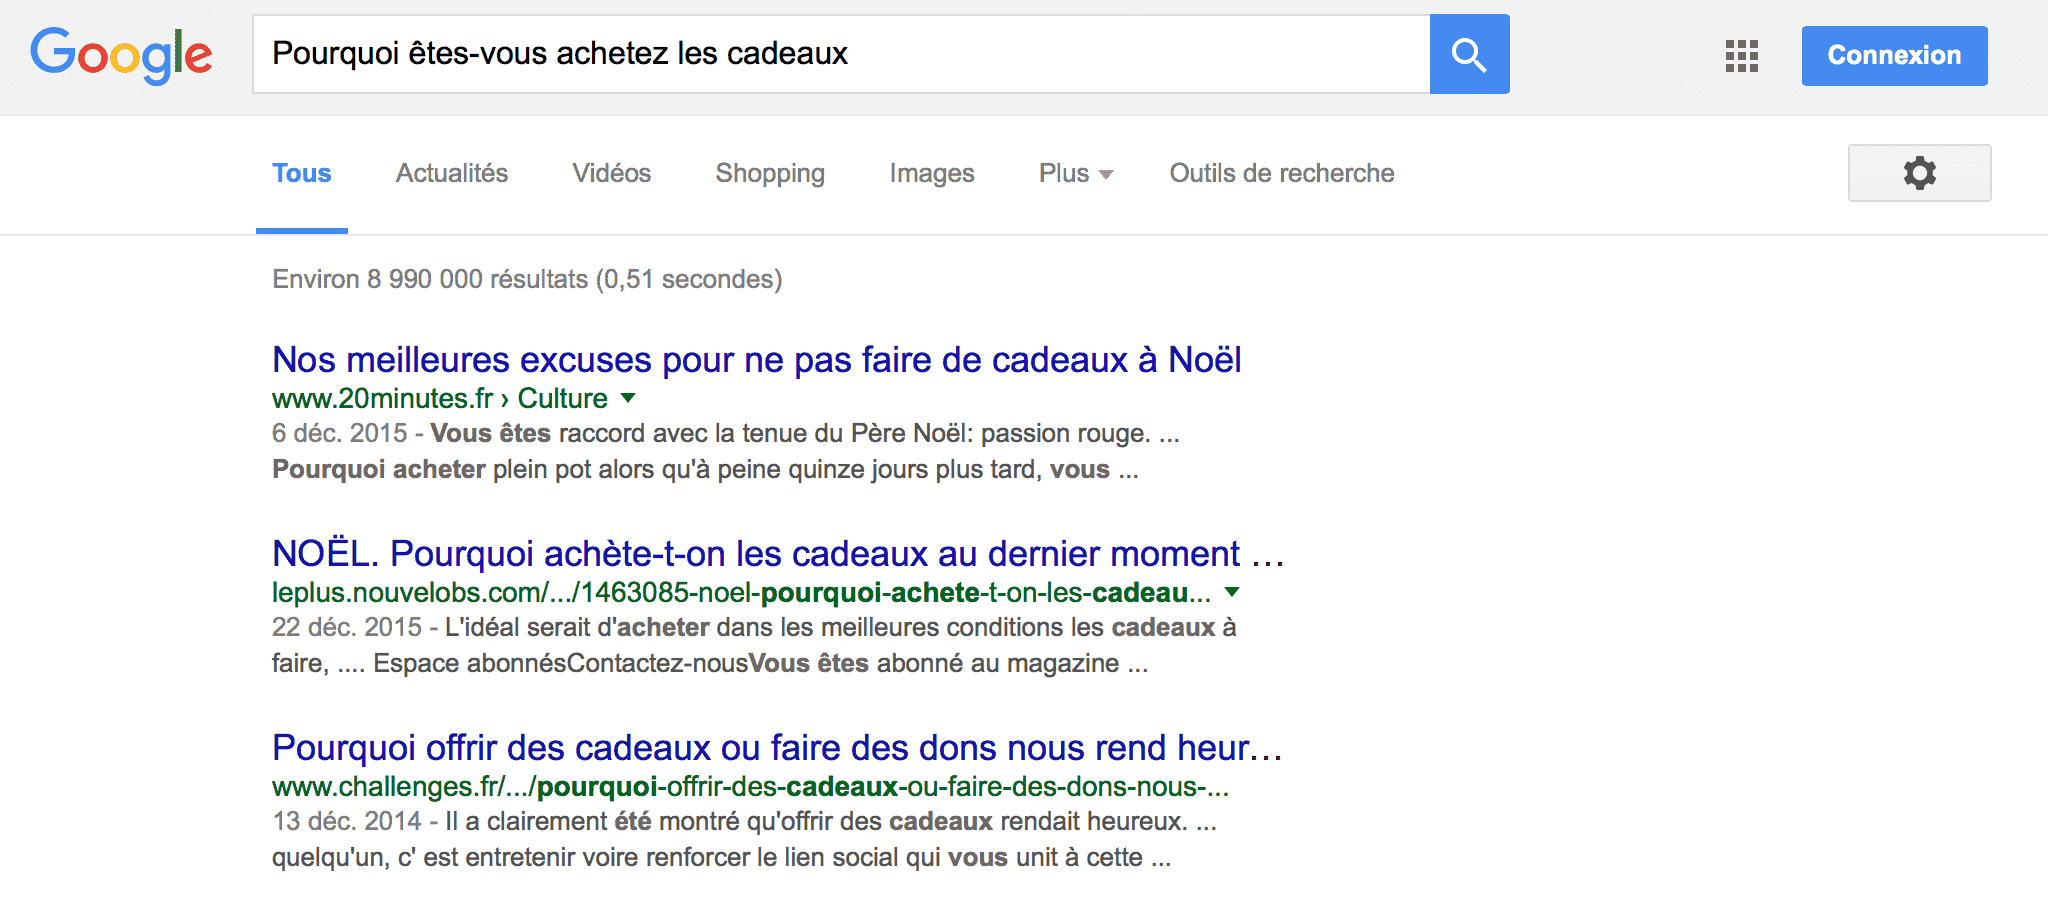 Google French grammar checker